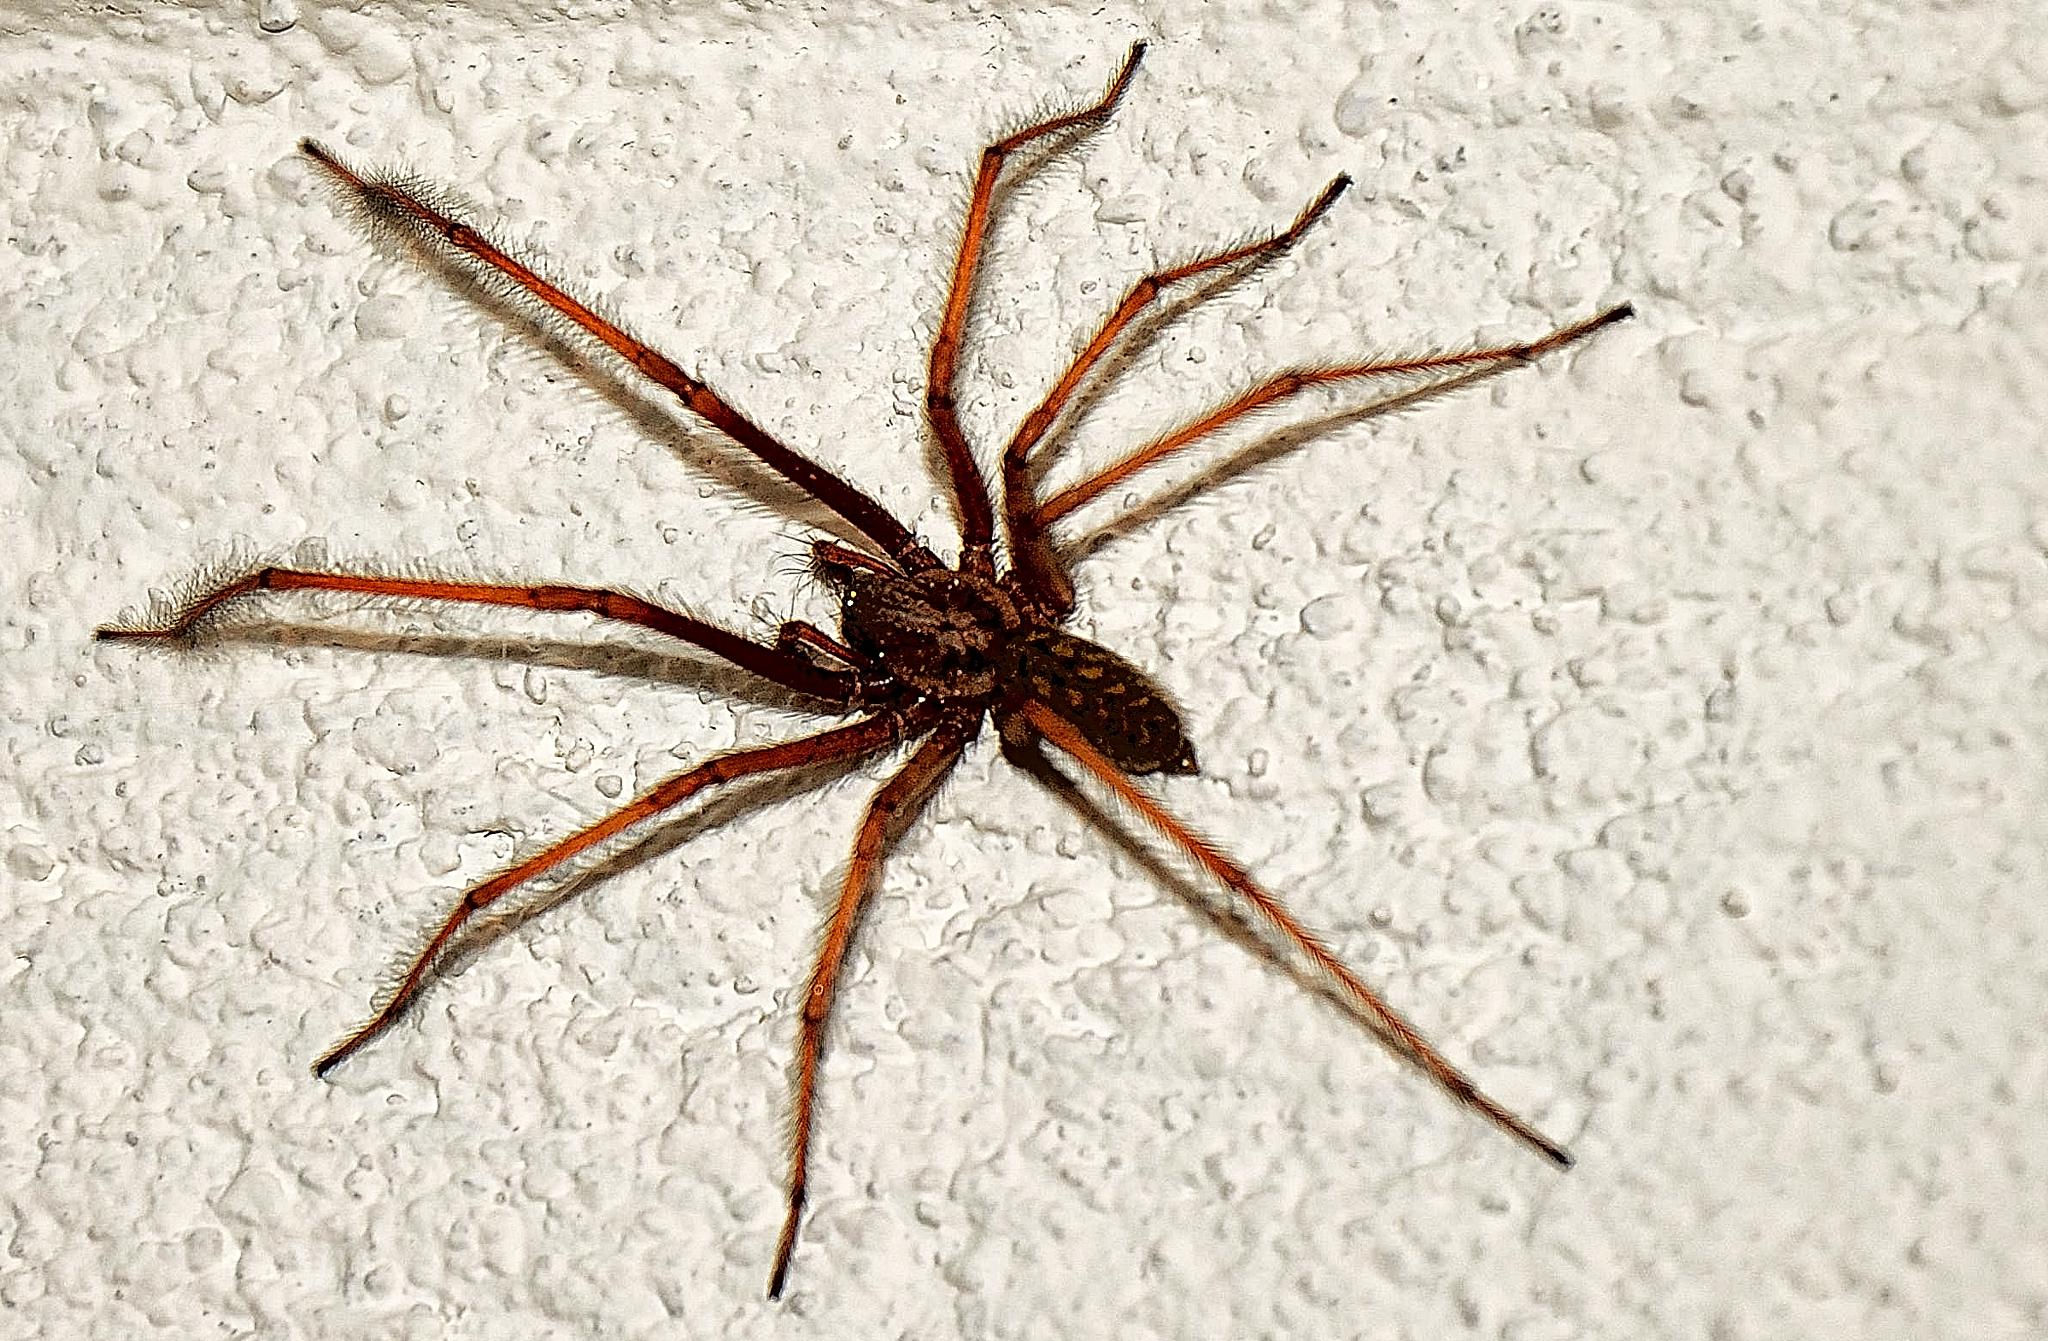 Spider by Lars Svendsen